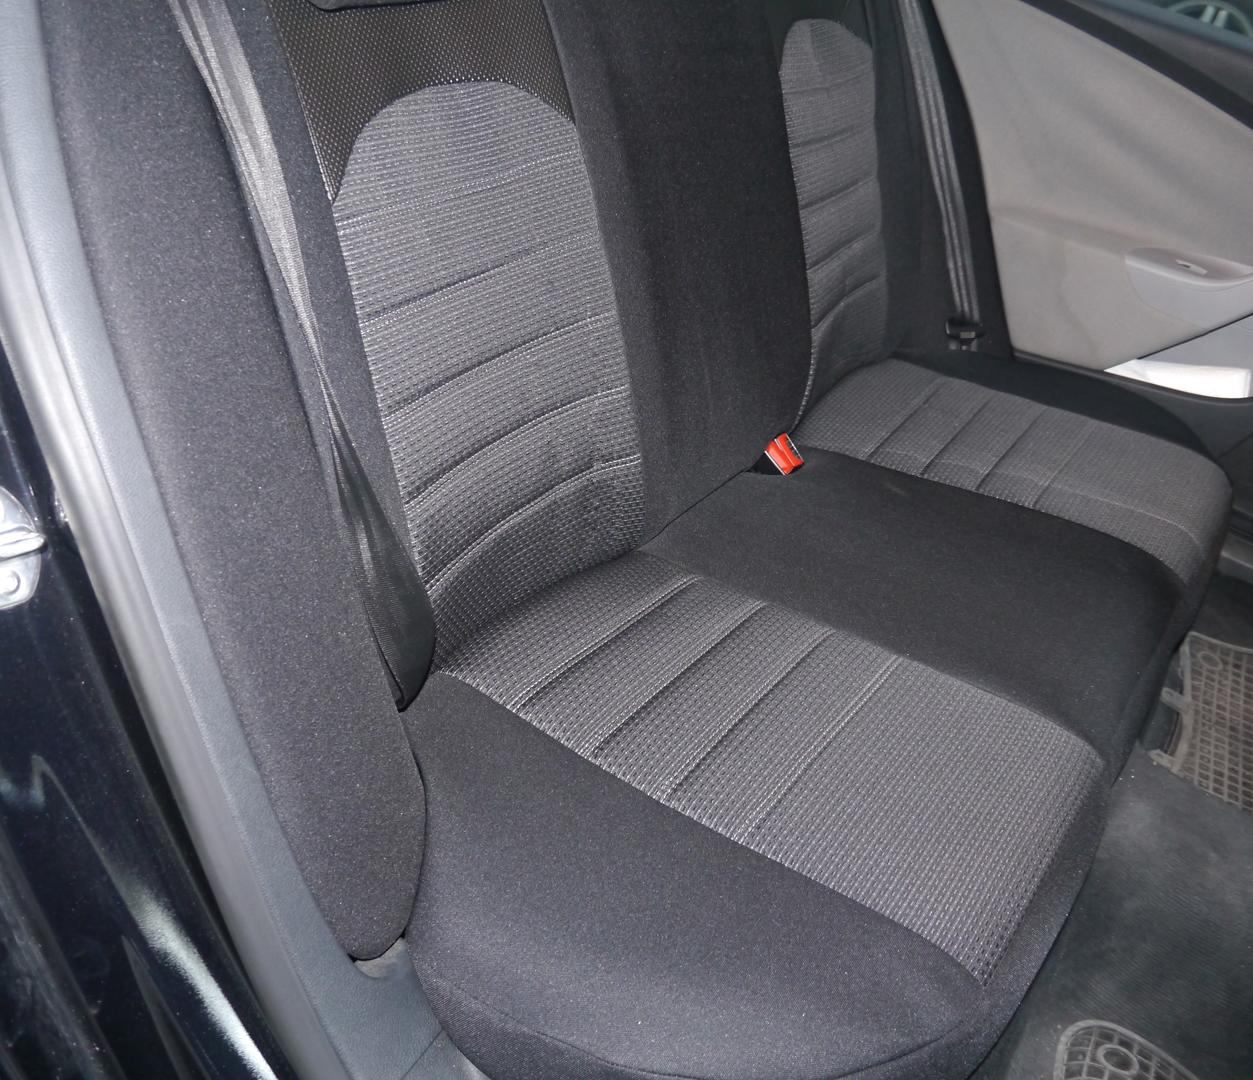 Car Seat Covers Protectors For Bmw 2 Series Gran Tourer